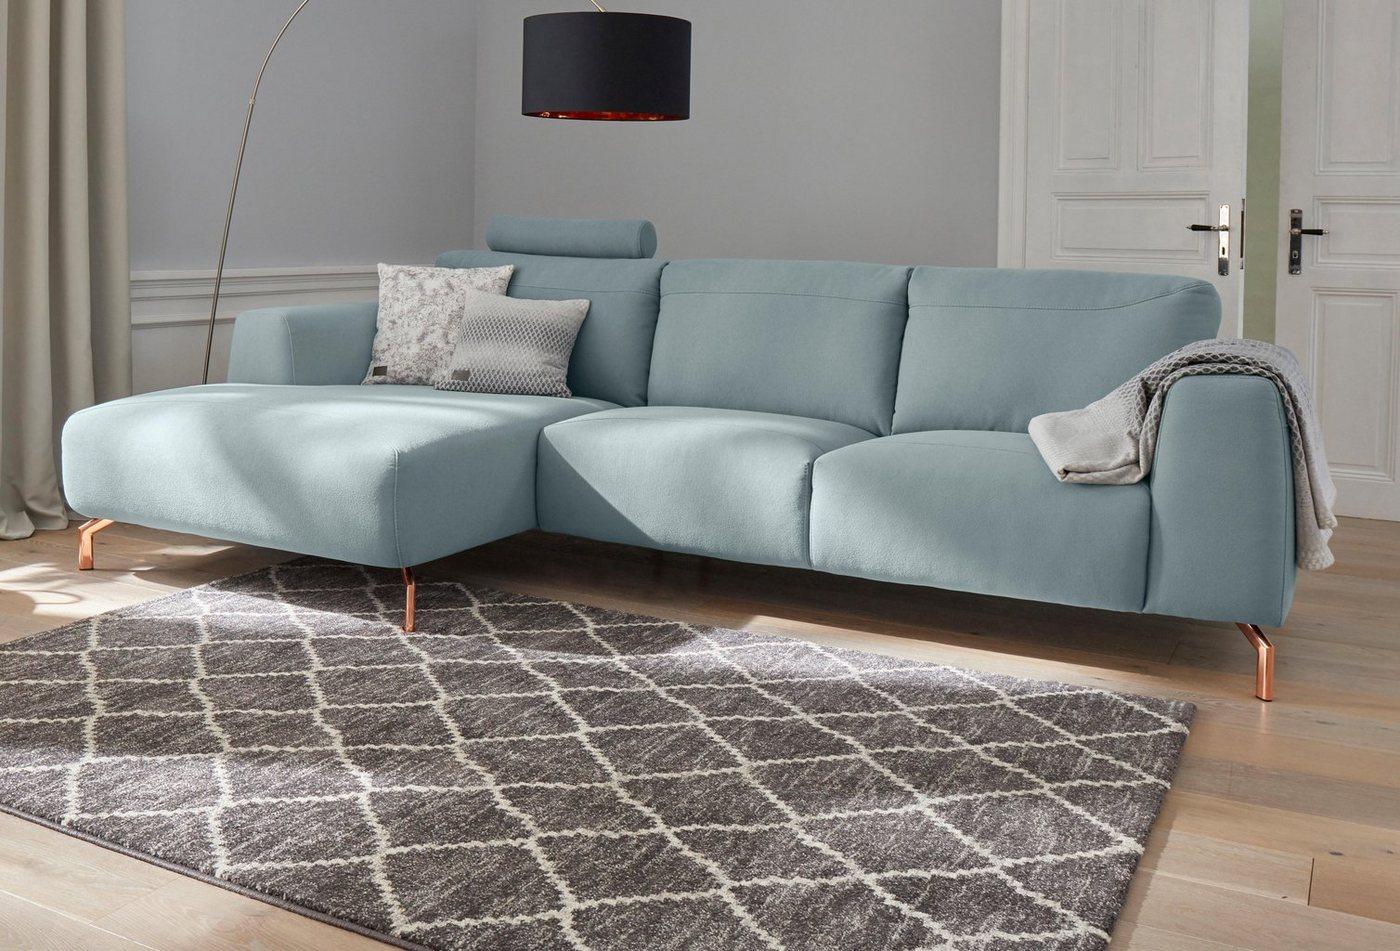 GMK Home & Living hoekbank Reval